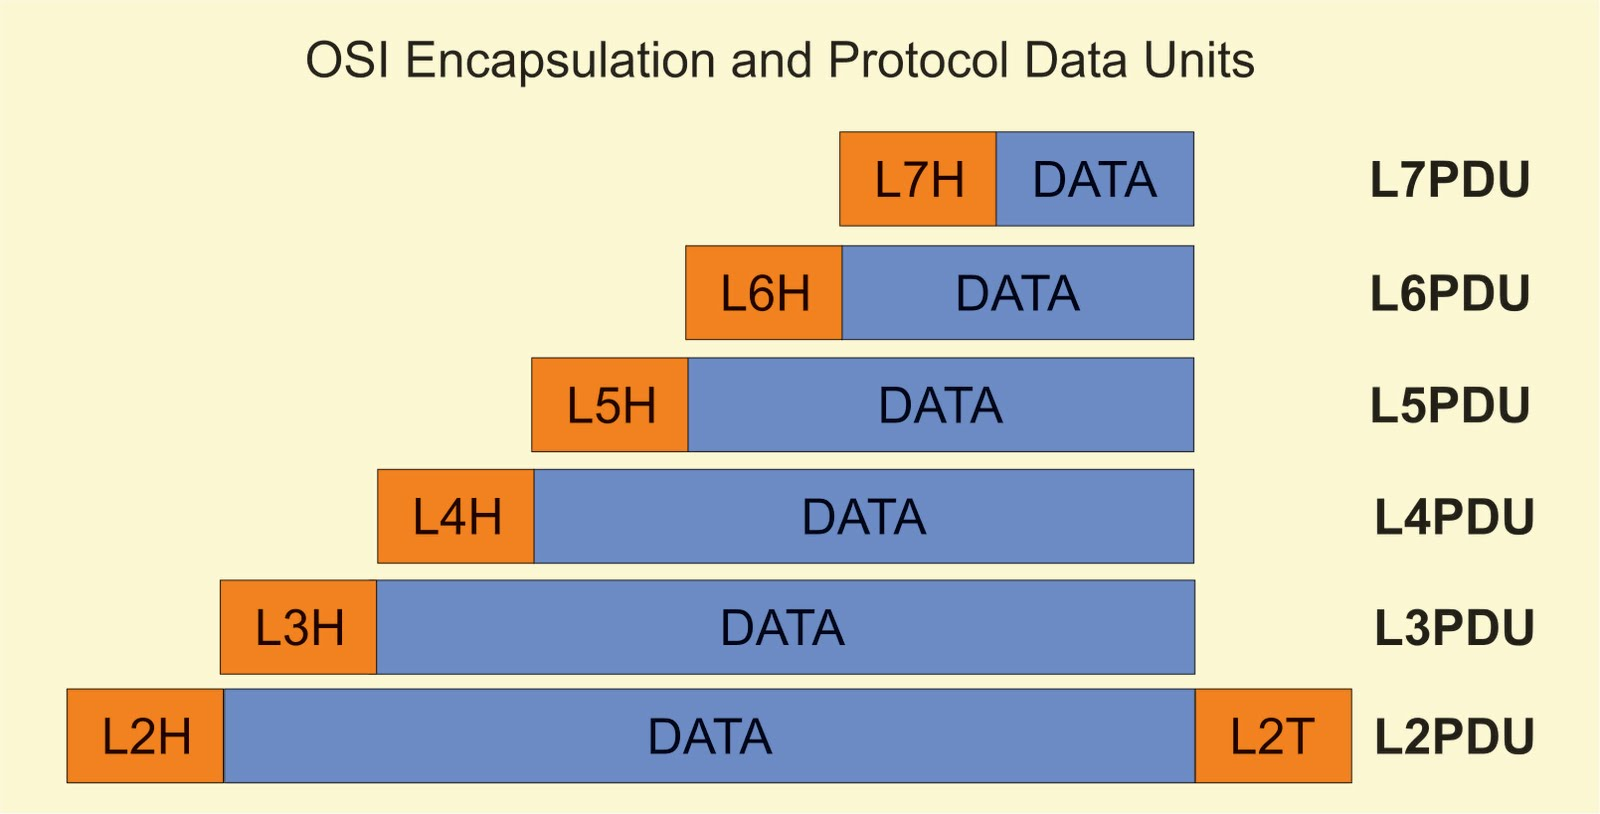 diagram of osi reference model dermis layer protocol data unit driverlayer search engine